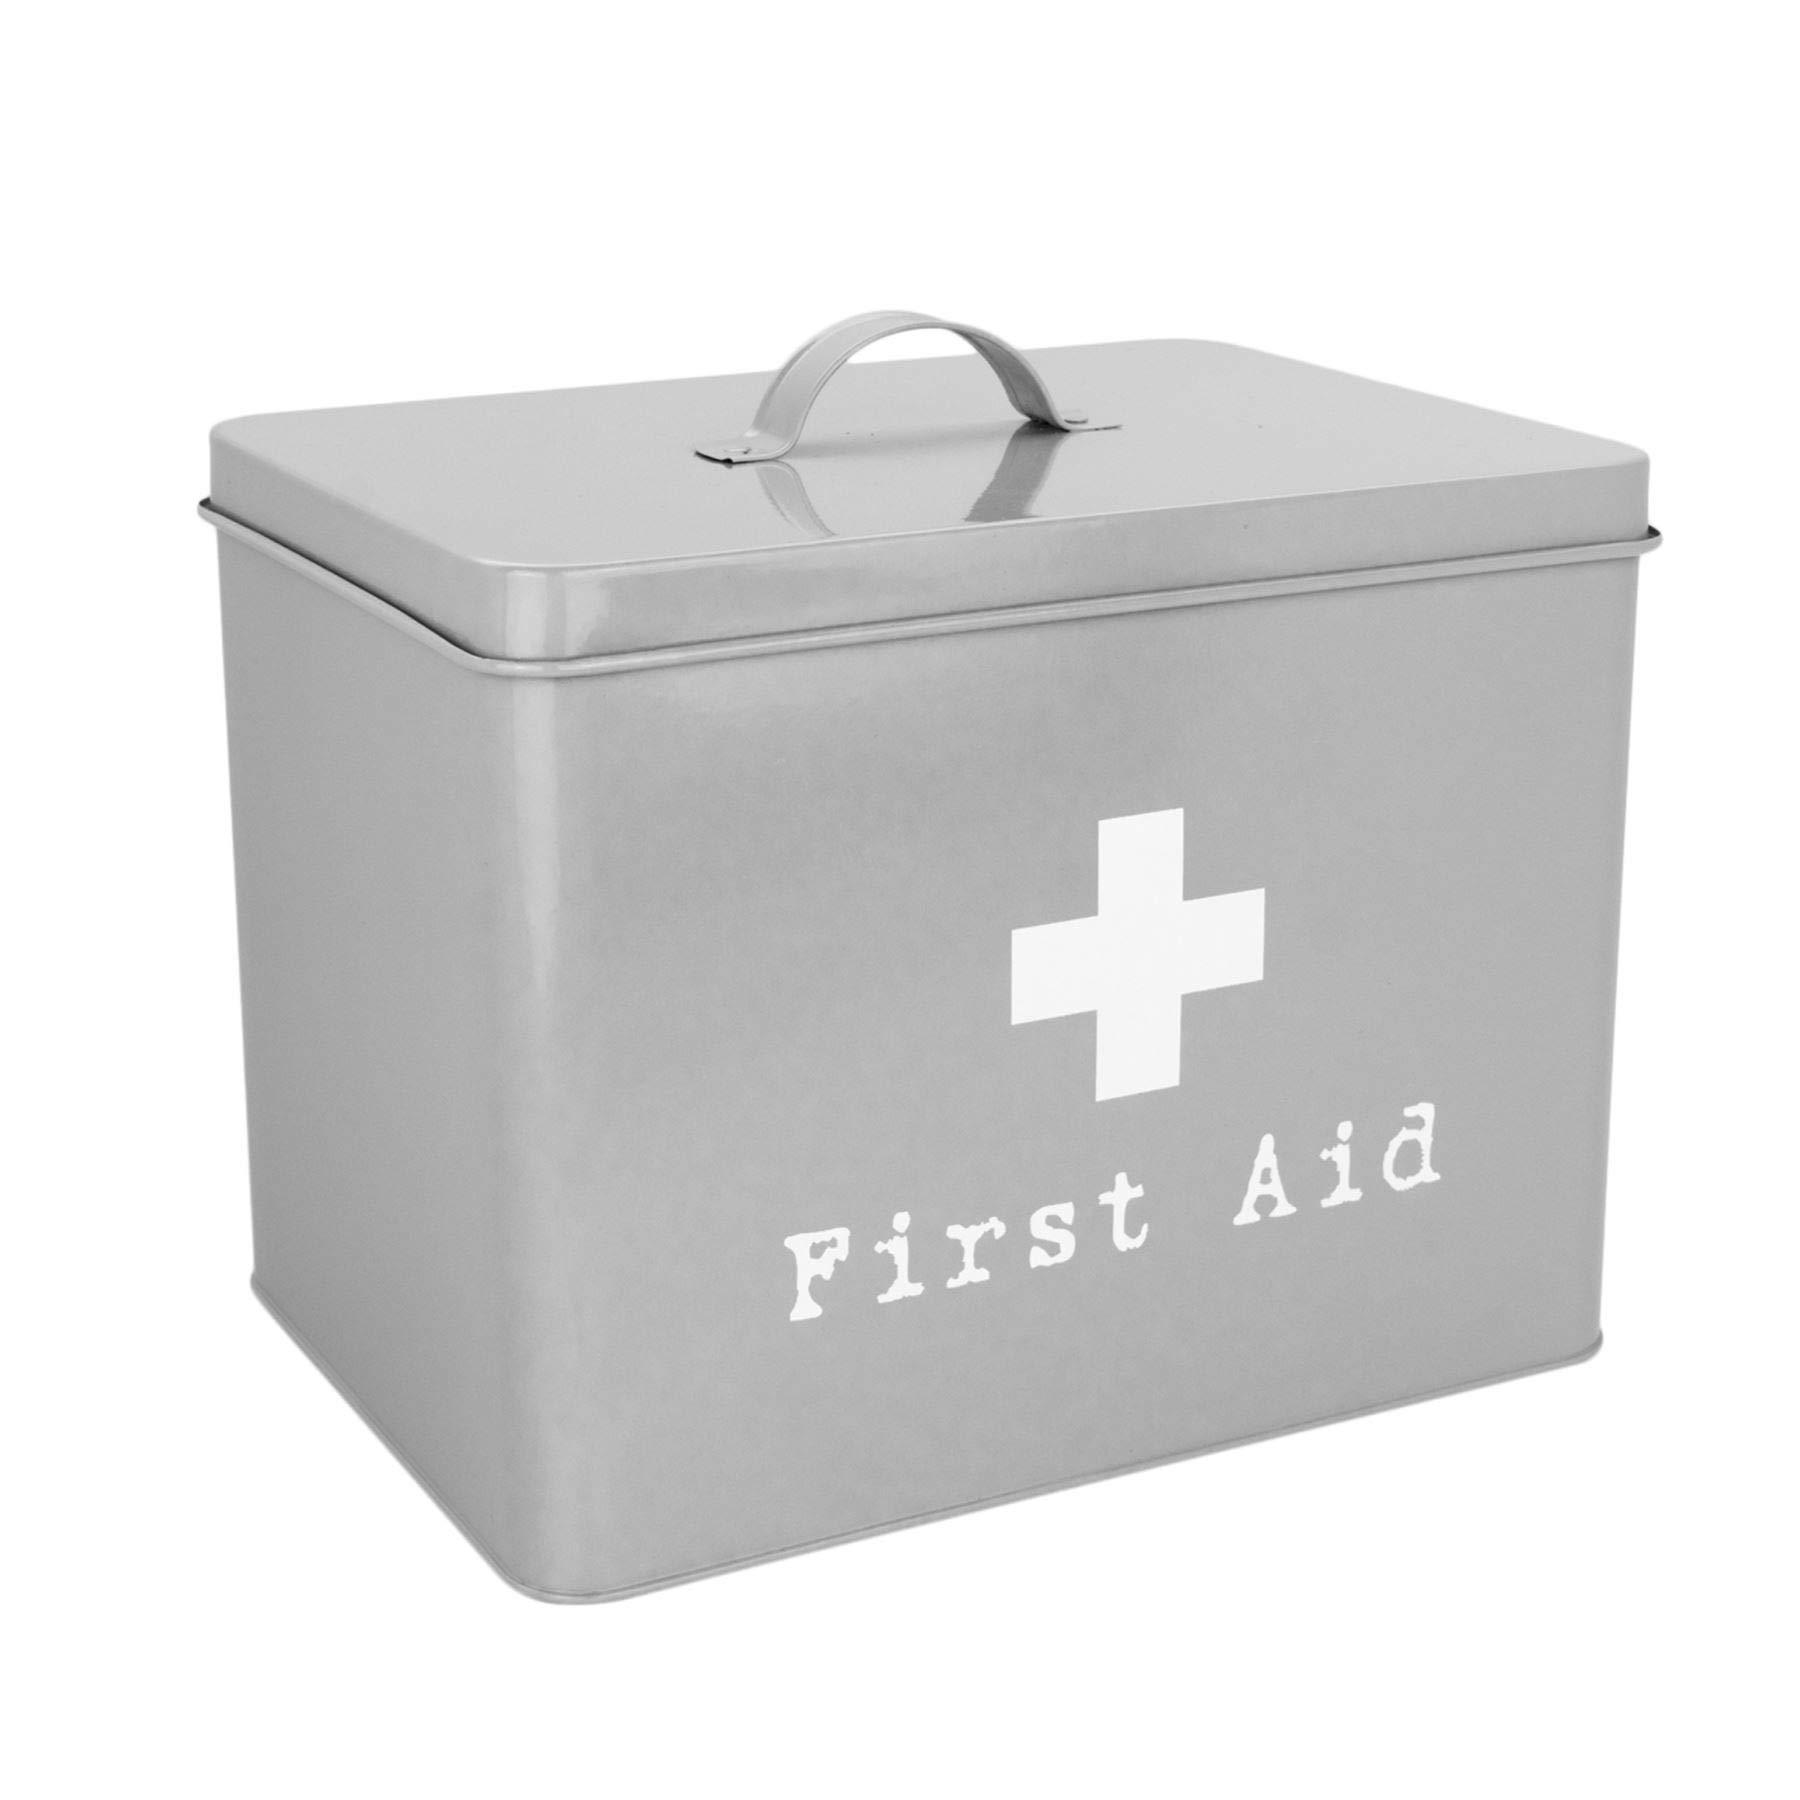 Harbour Housewares First Aid Medicine Storage Box in Vintage Metal - Grey by Harbour Housewares